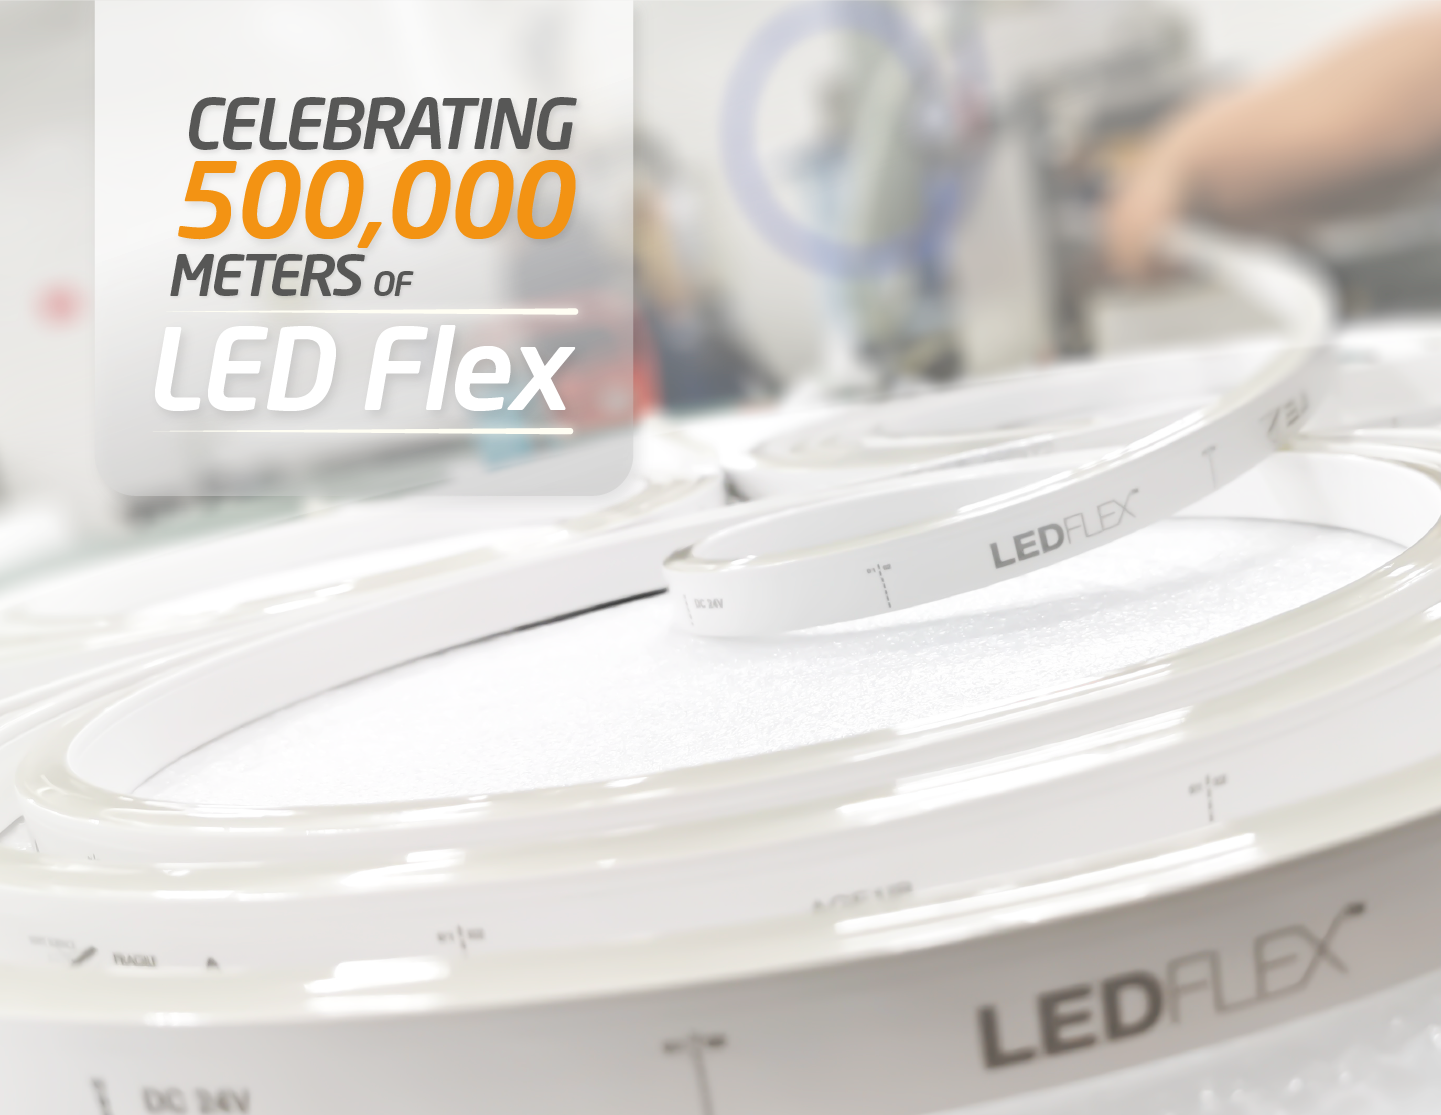 Celebrating 500,000 meters of LEDFlex